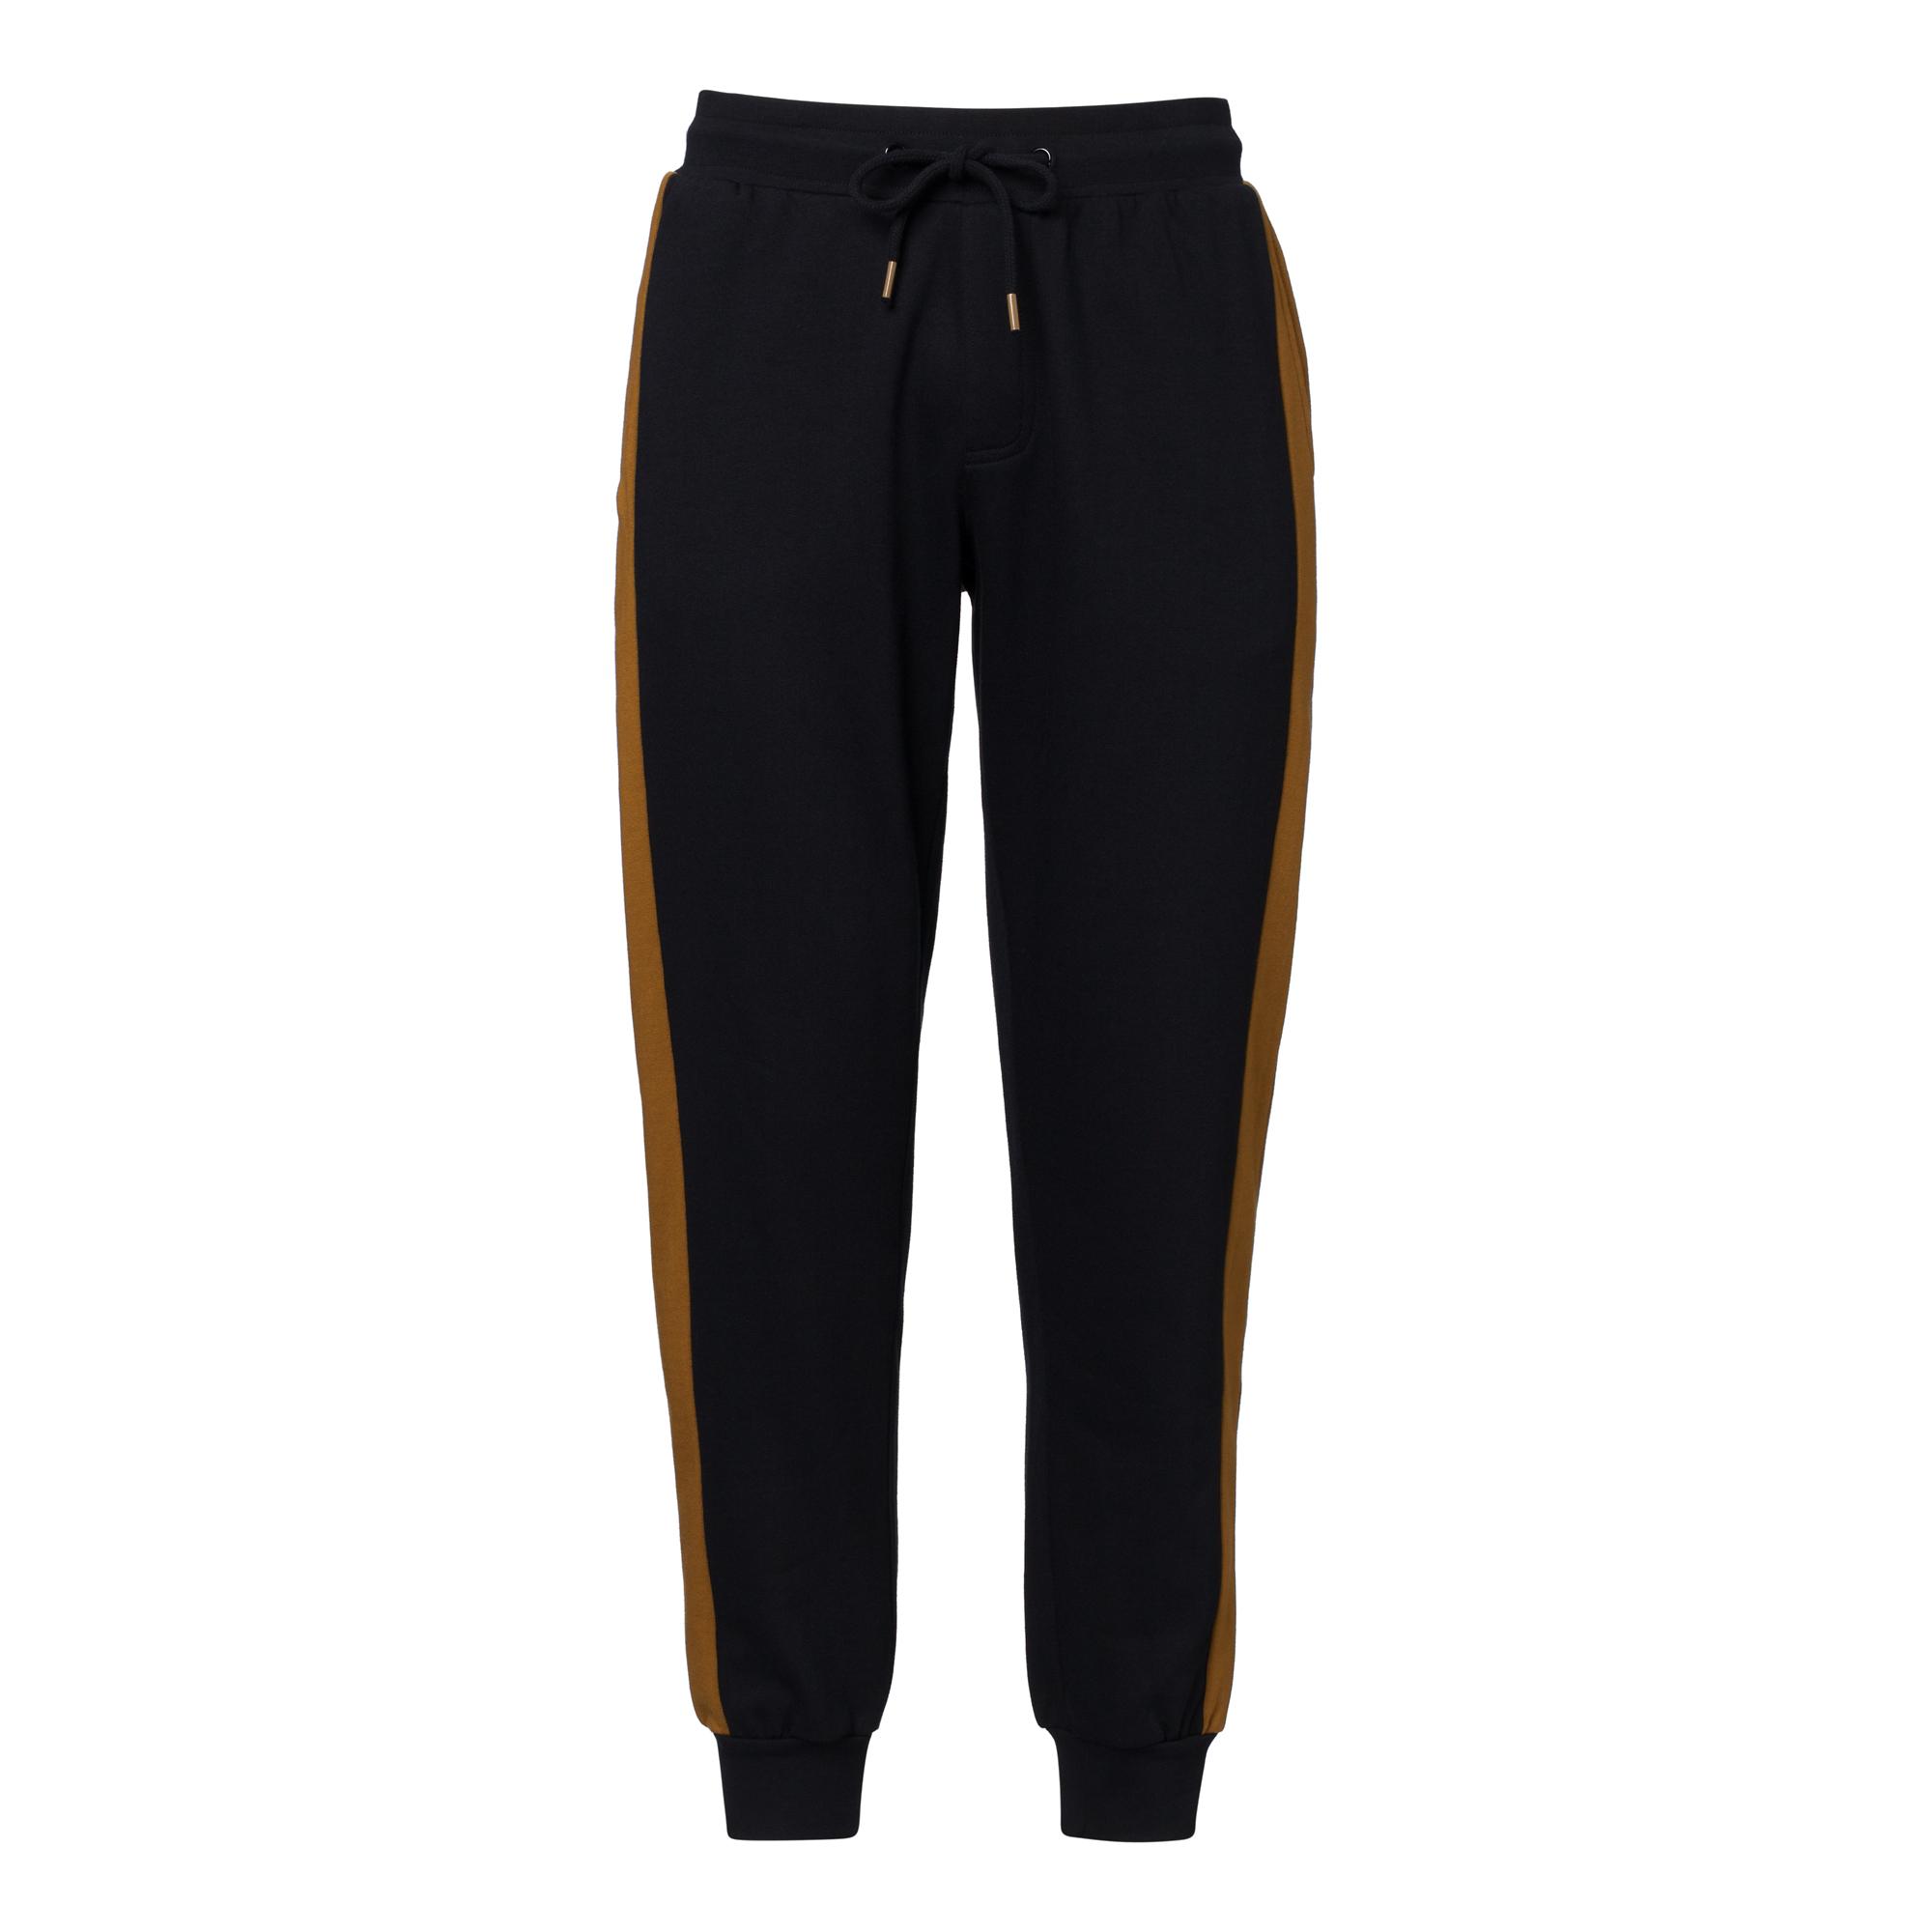 TT1010 Joggingpants Man Black/Side Stripe GOTS & Fairtrade